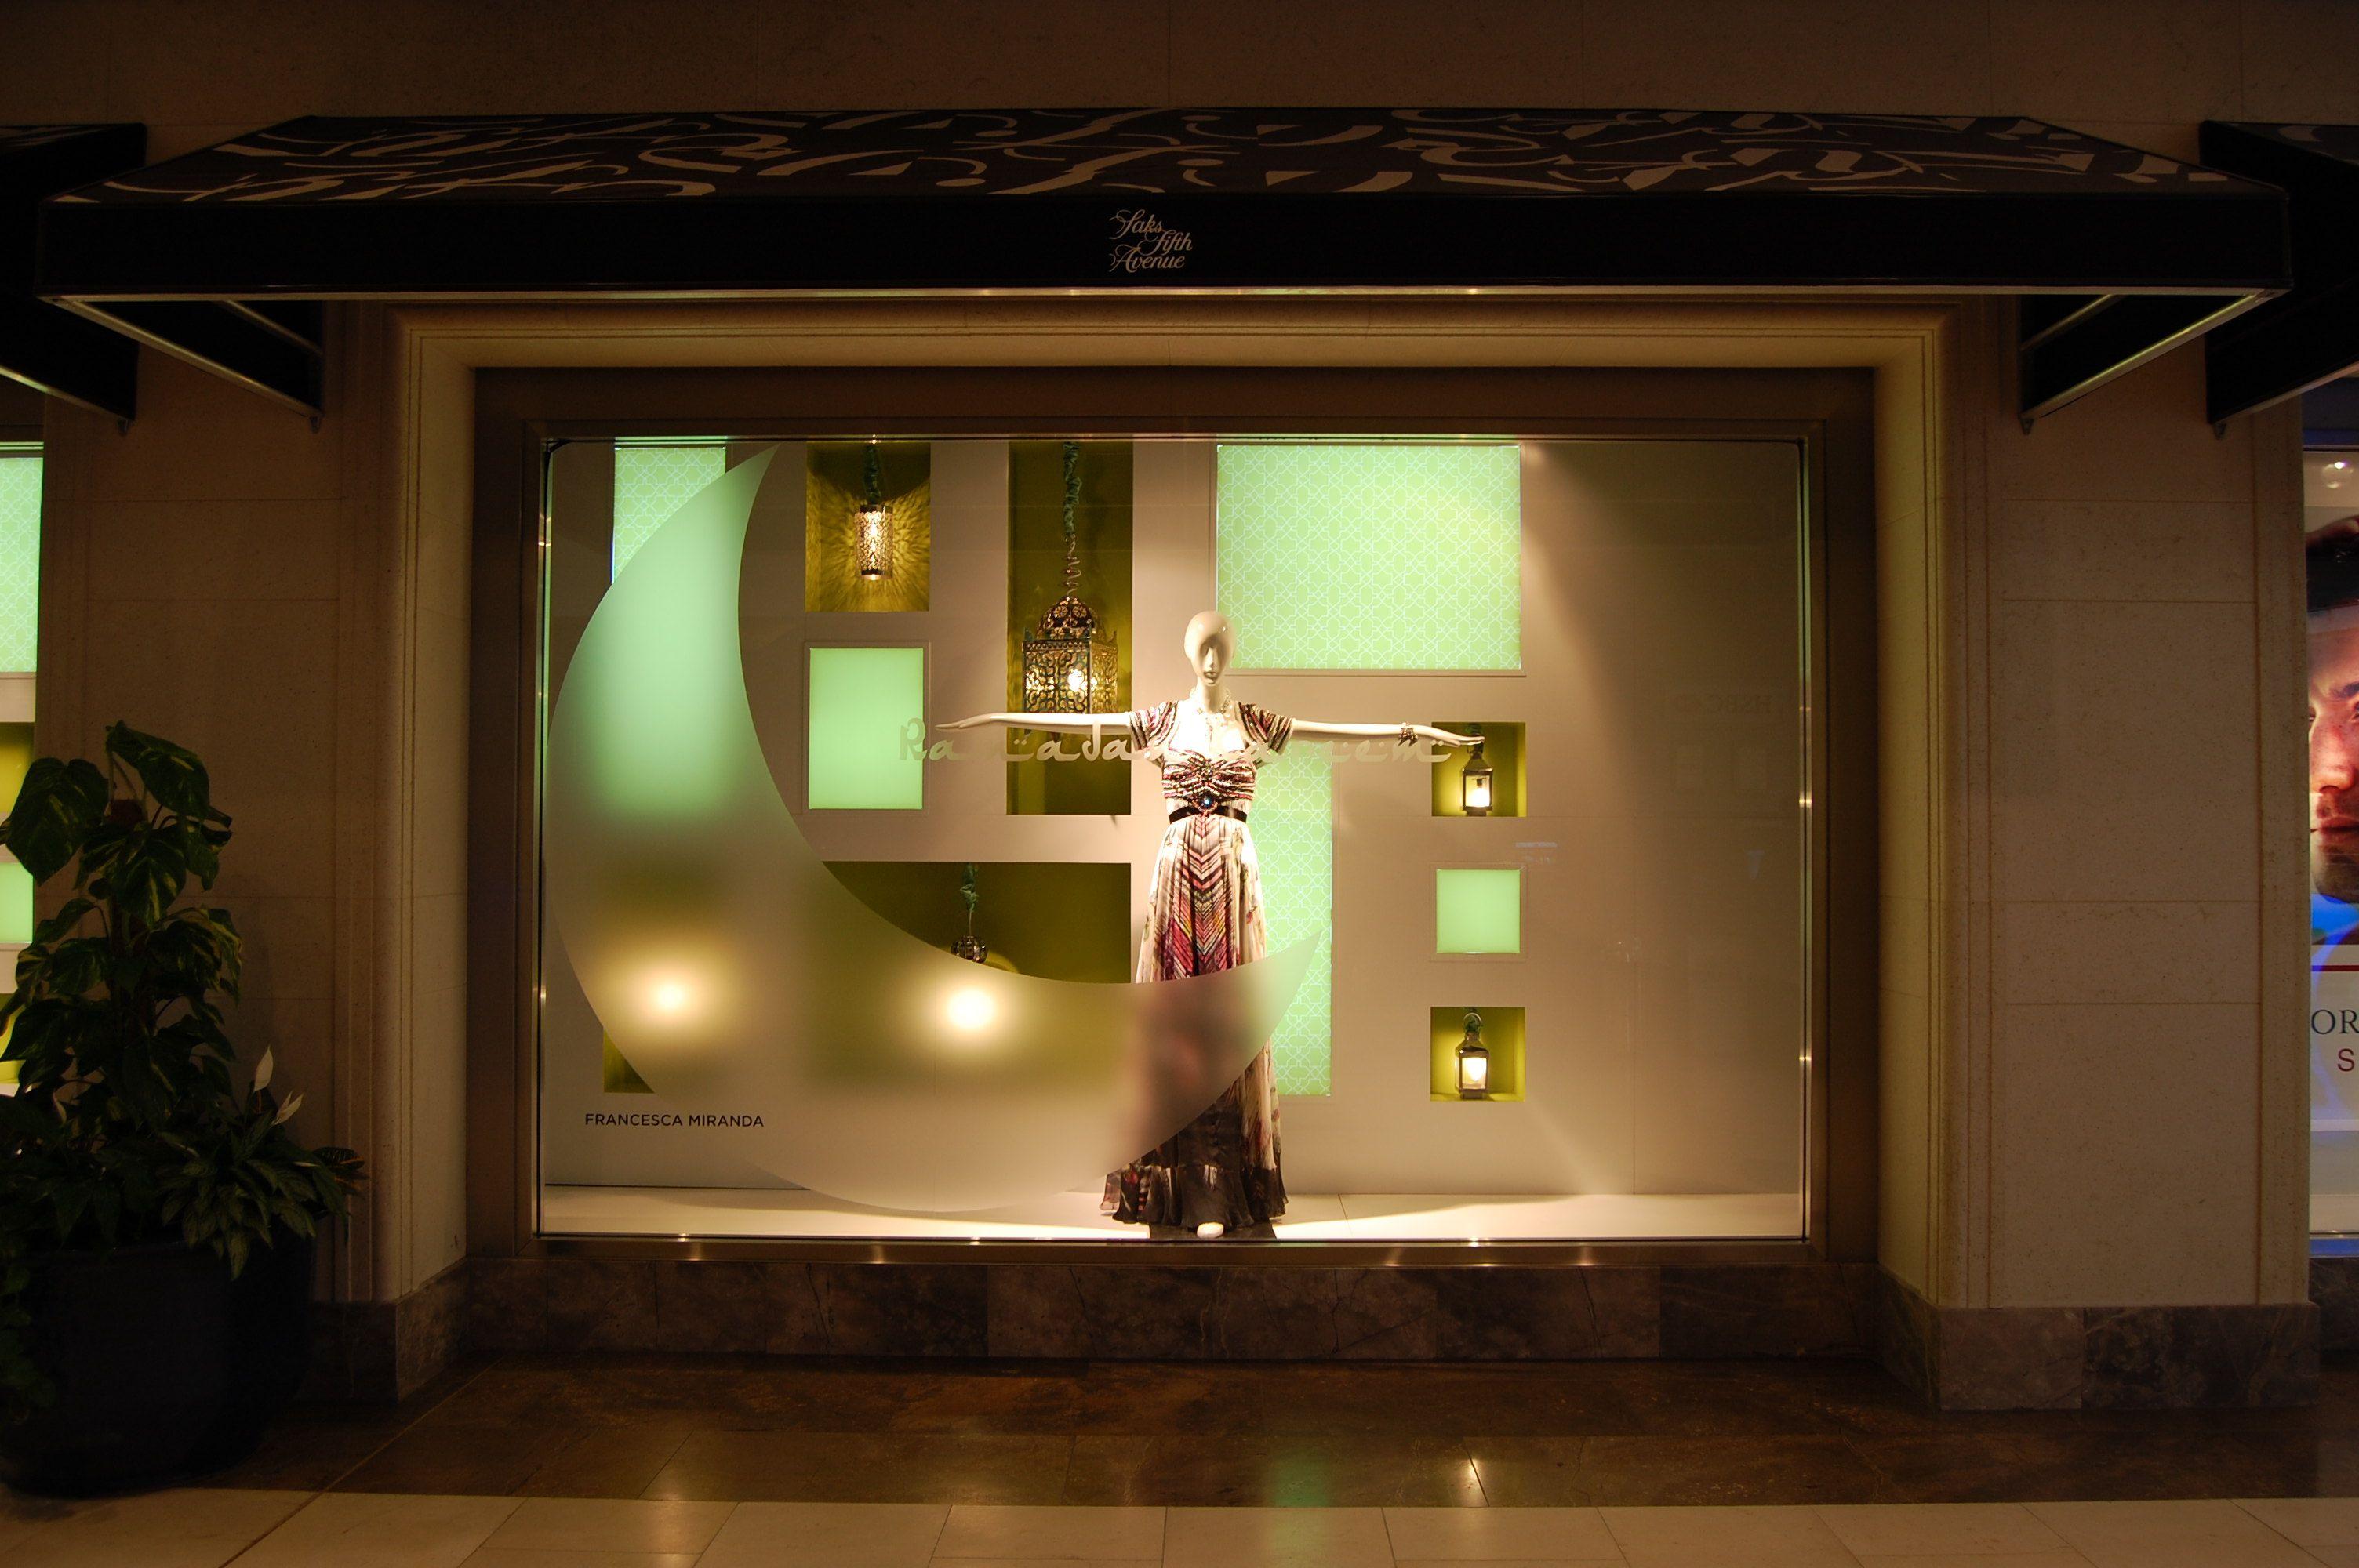 RAMADAN WINDOW | Visual merchandising, Windows, Bathroom ... on jerusalem window, jesus window, valentines day window, thank you window, fashion window, new year window,